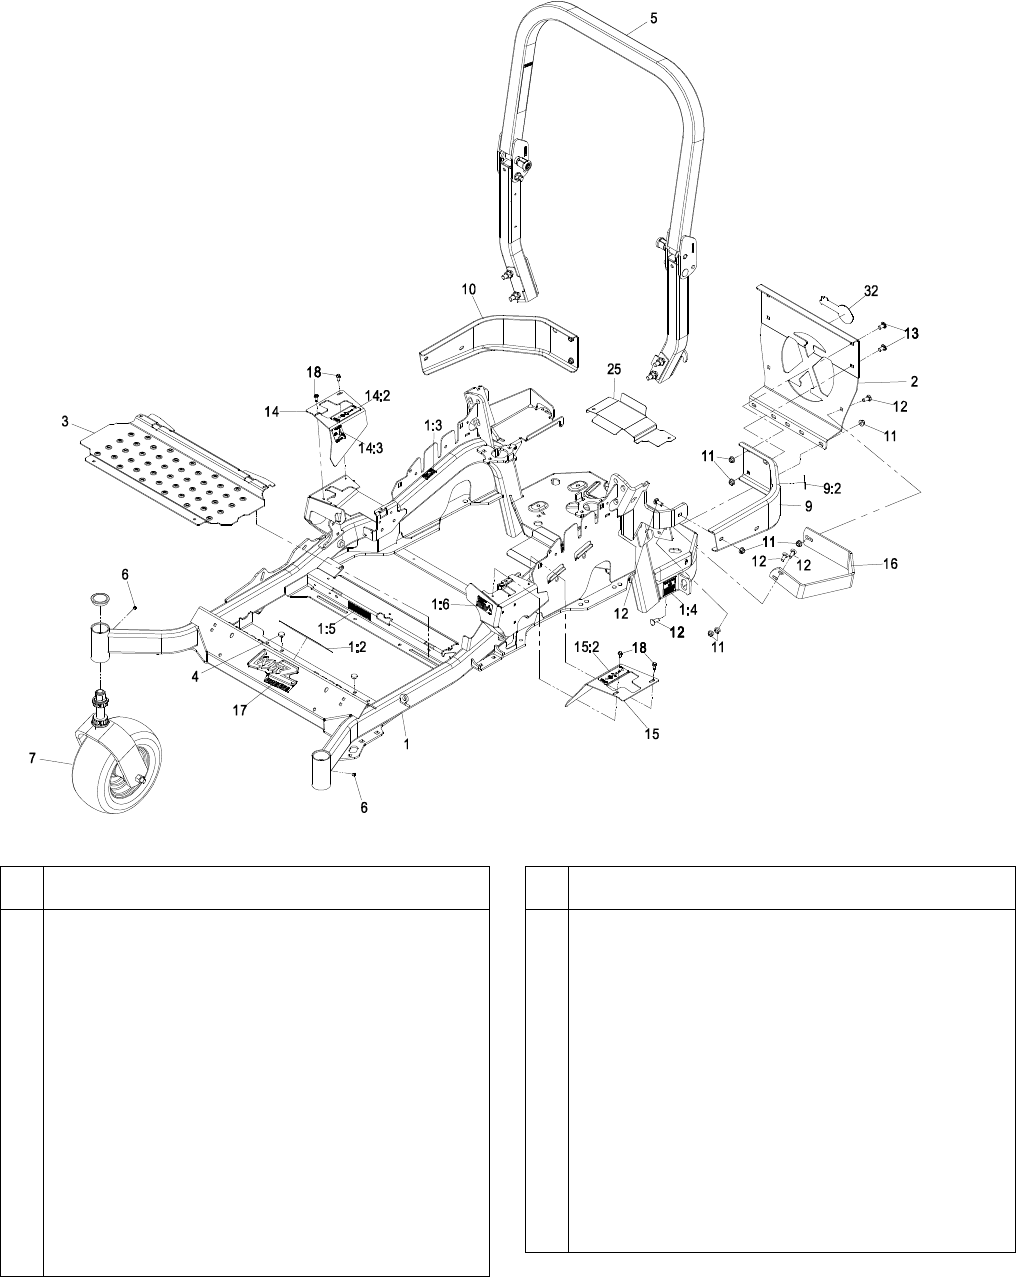 Exmark Lazer Z Lawn Mower Lhp4820kc Users Manual 4500 567 Pto Wiring Diagram Mainframe Group